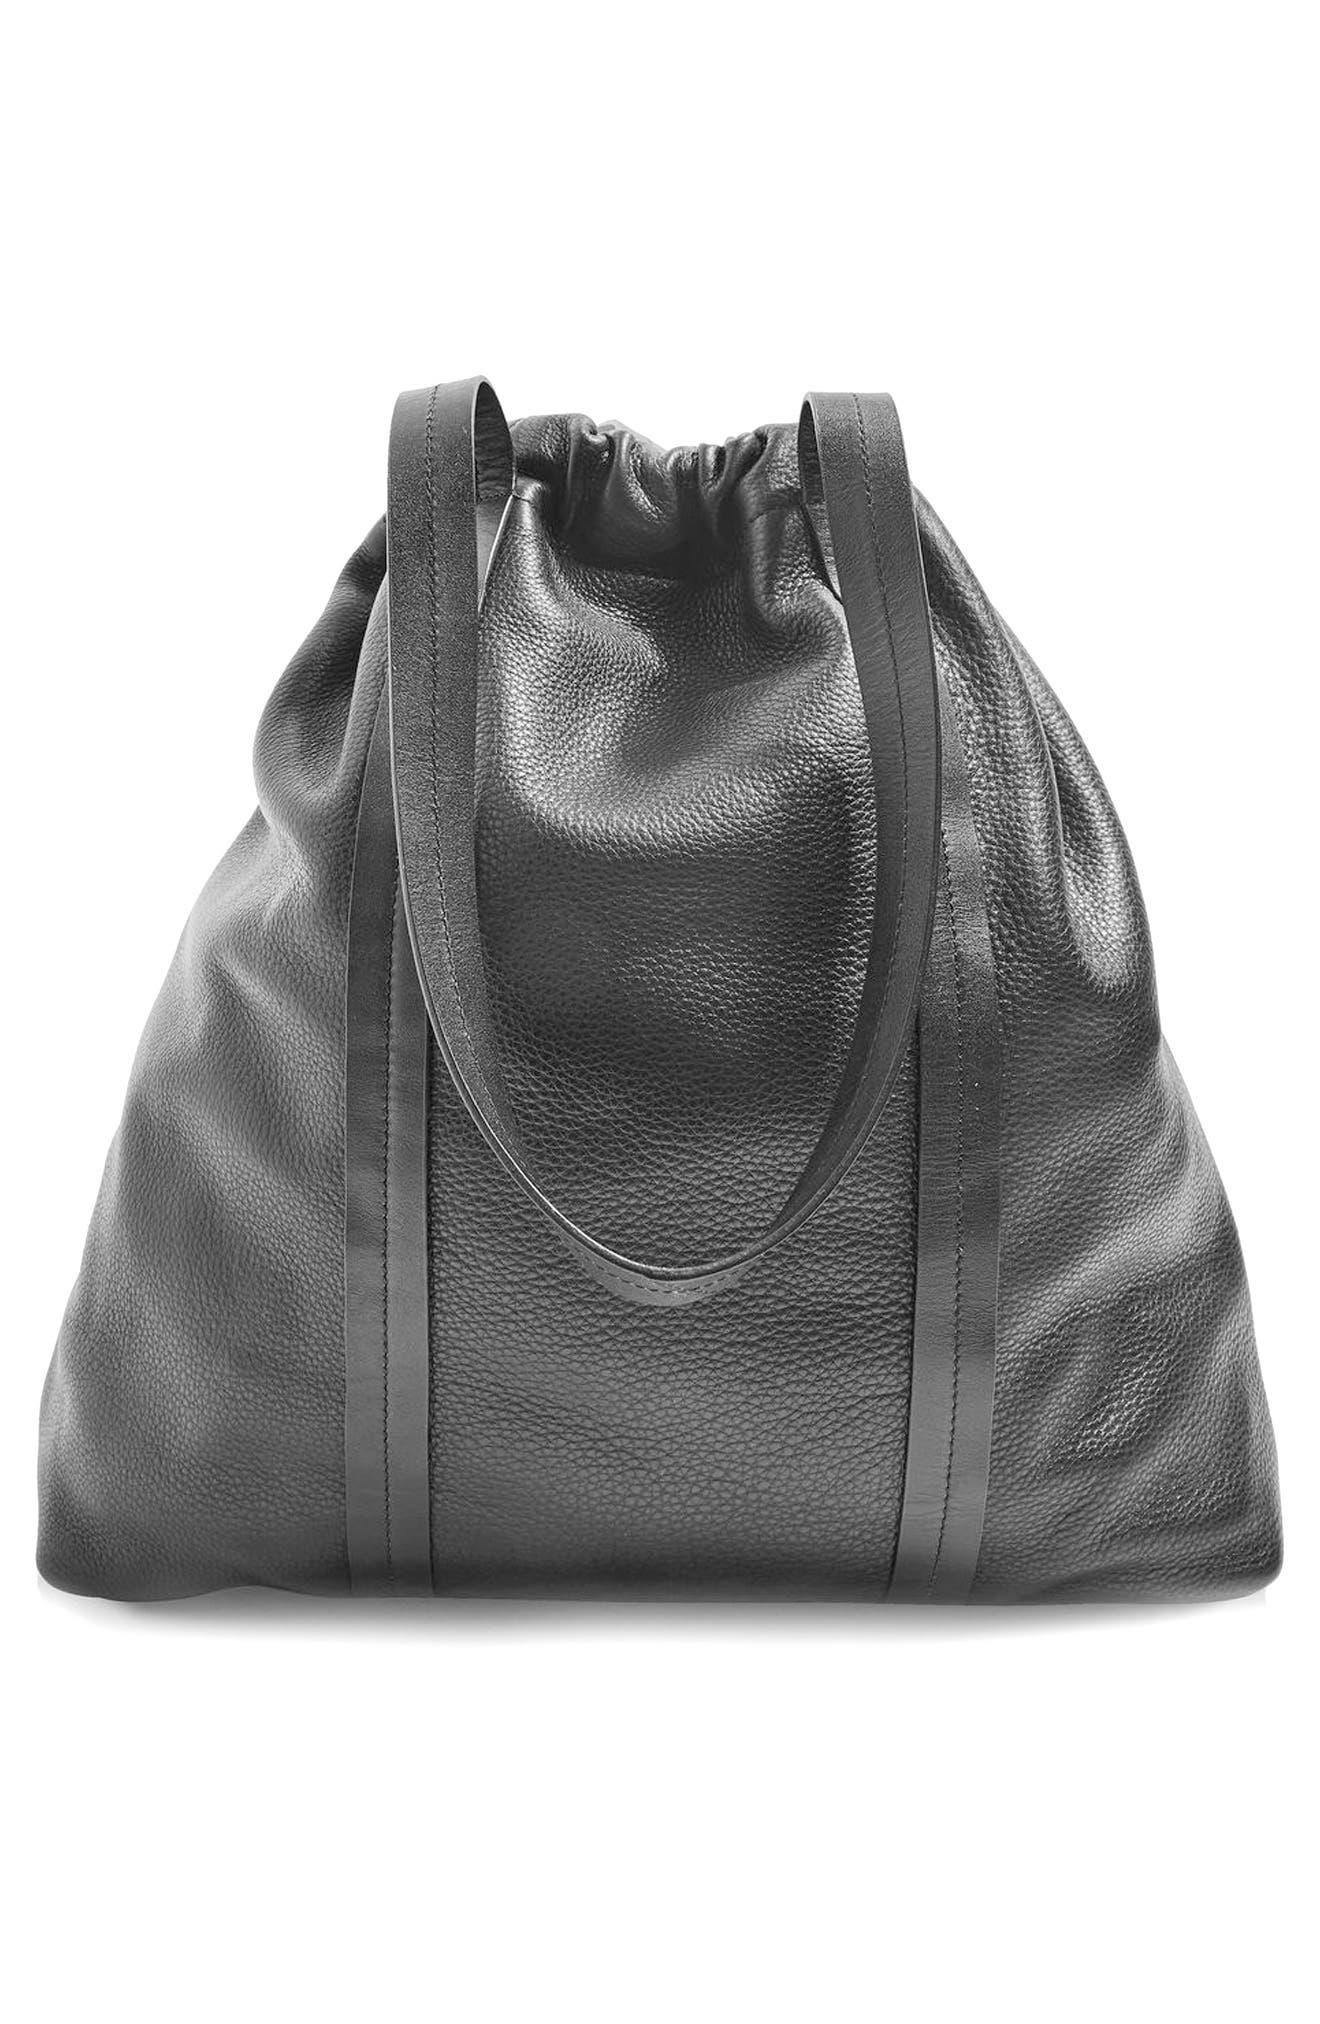 Premium Leather Drawstring Shoulder Bag,                             Alternate thumbnail 3, color,                             001